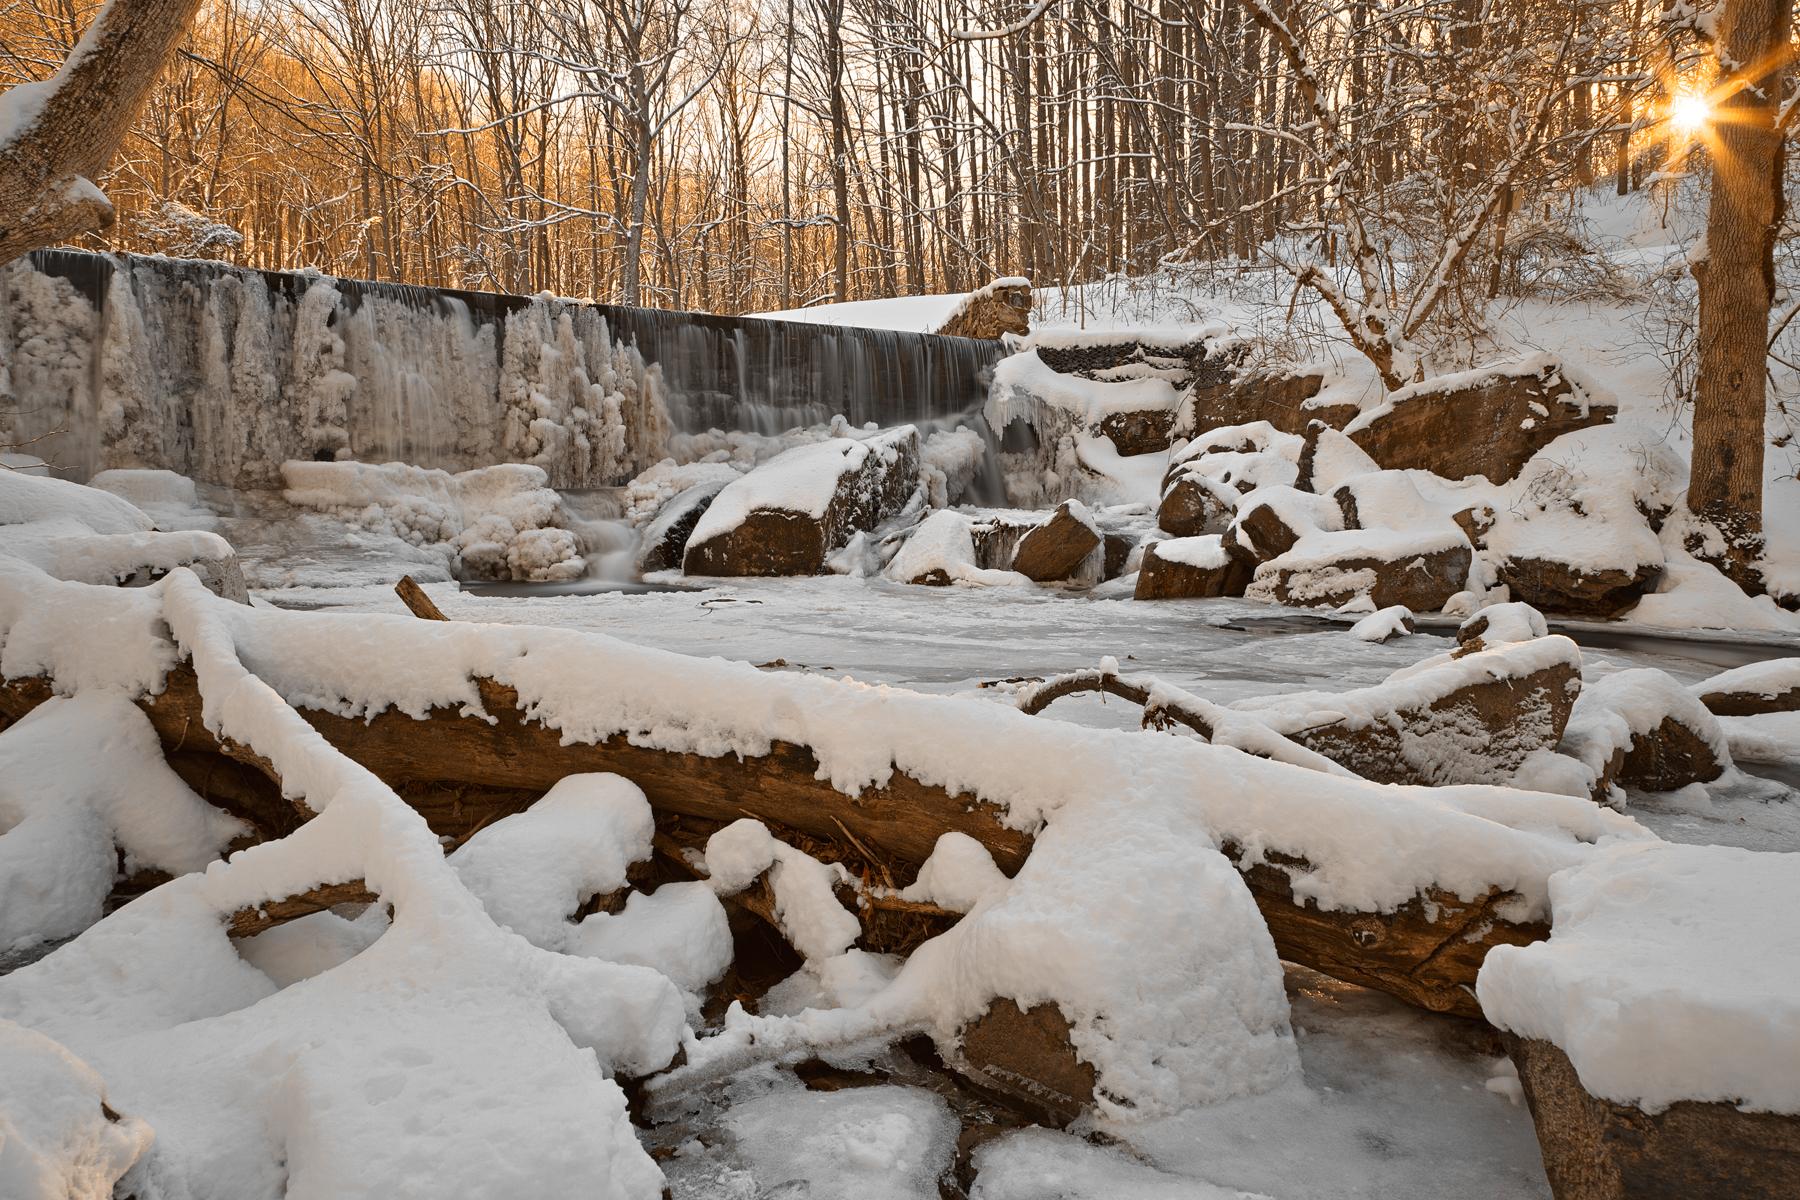 Susquehanna Winter Sunset Falls - HDR, America, Shine, Serenity, Shade, HQ Photo